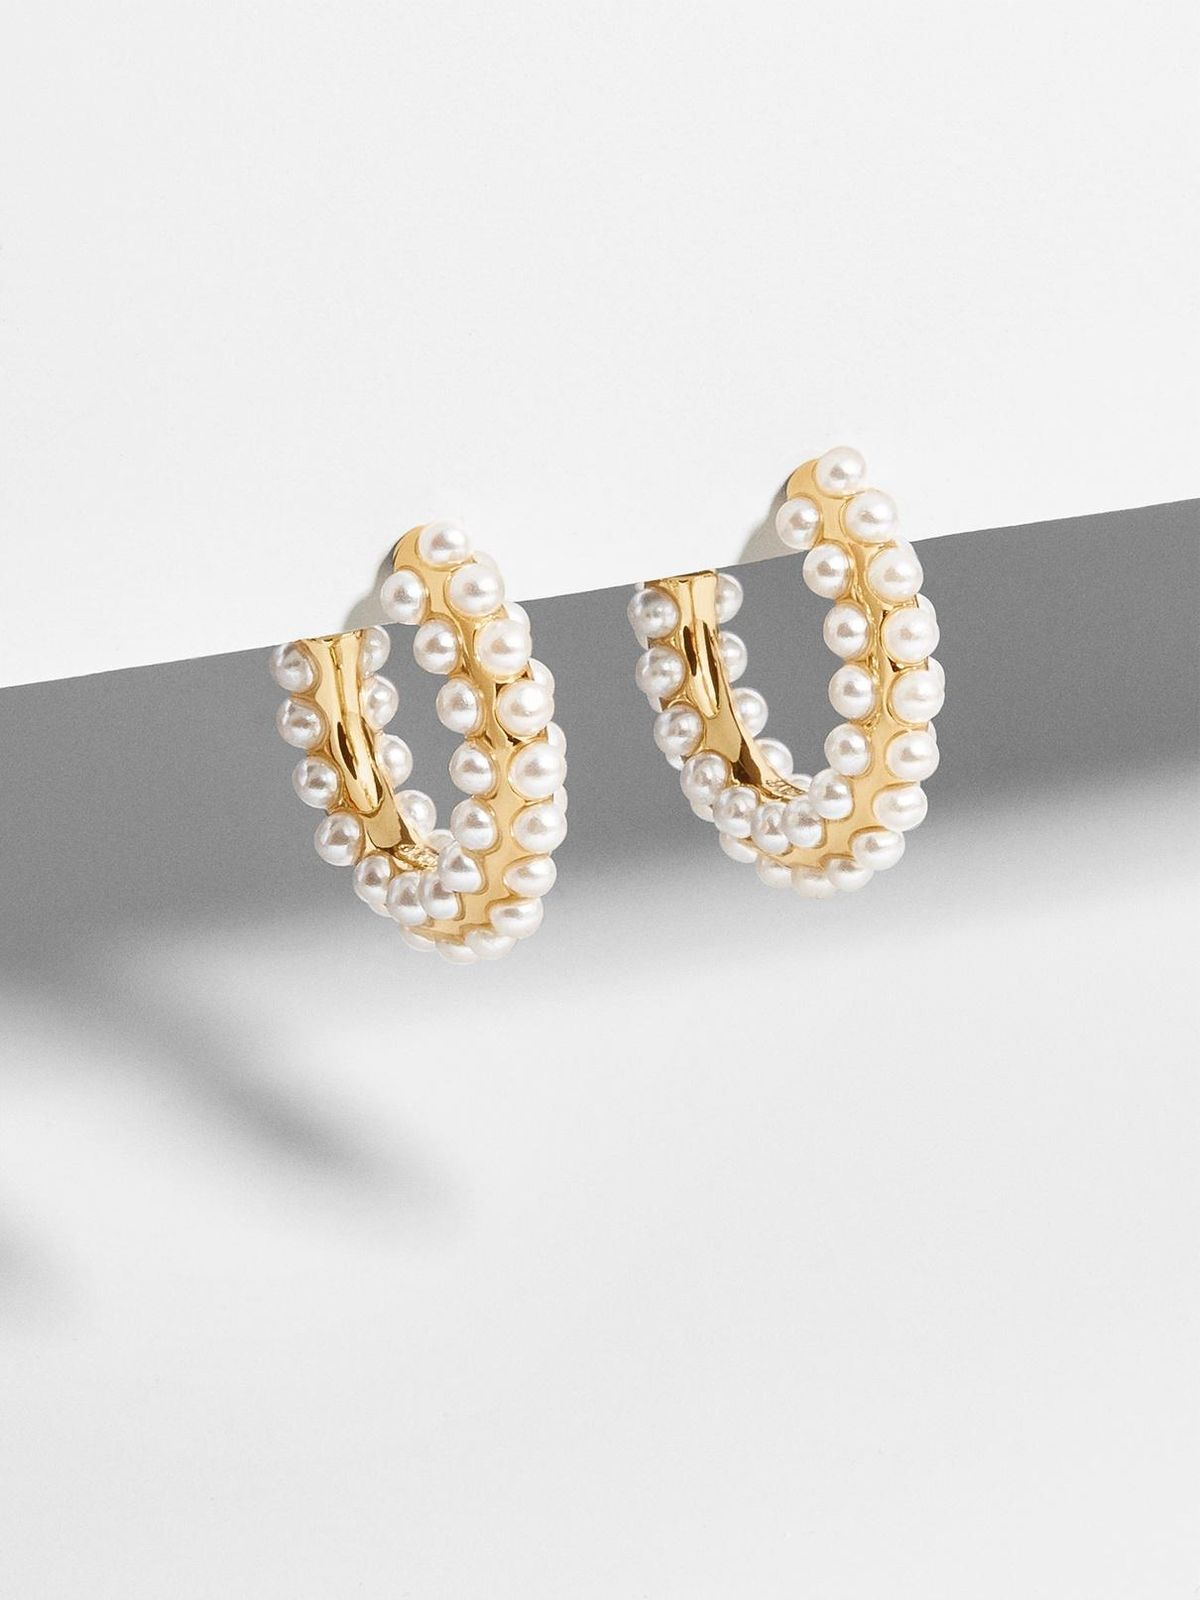 baublebar nina earrings